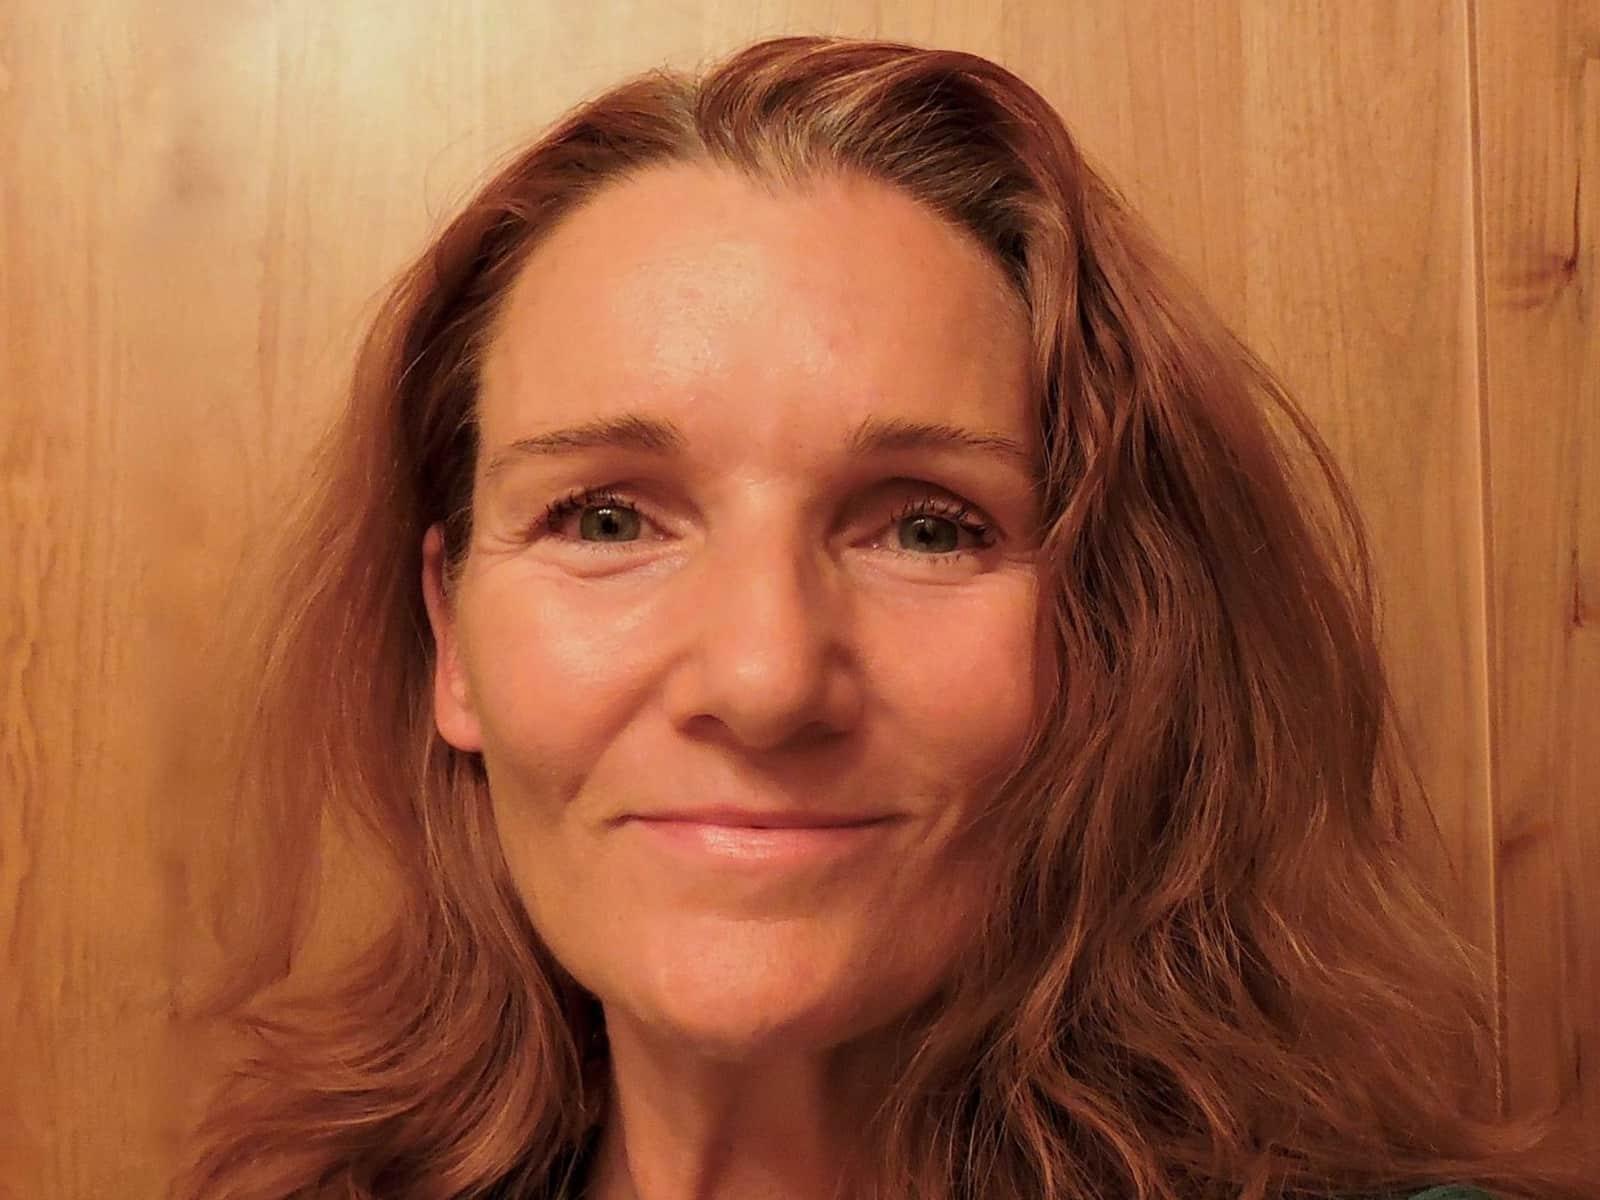 Julie from Mullumbimby, New South Wales, Australia